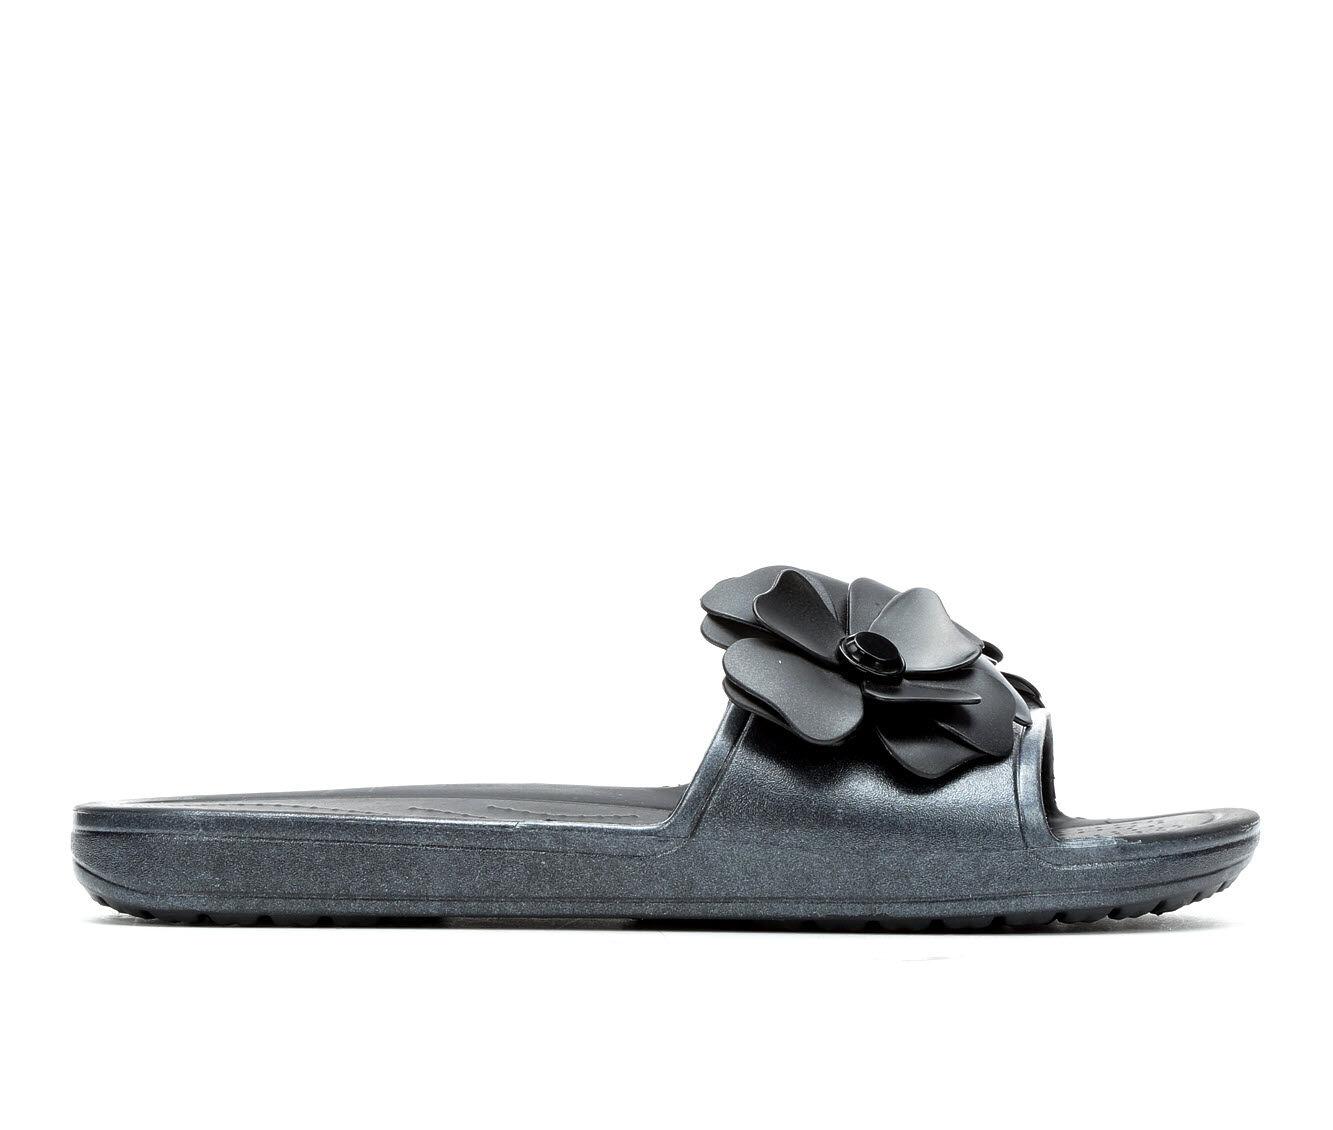 Women's Crocs Vivid Blooms Slides Black